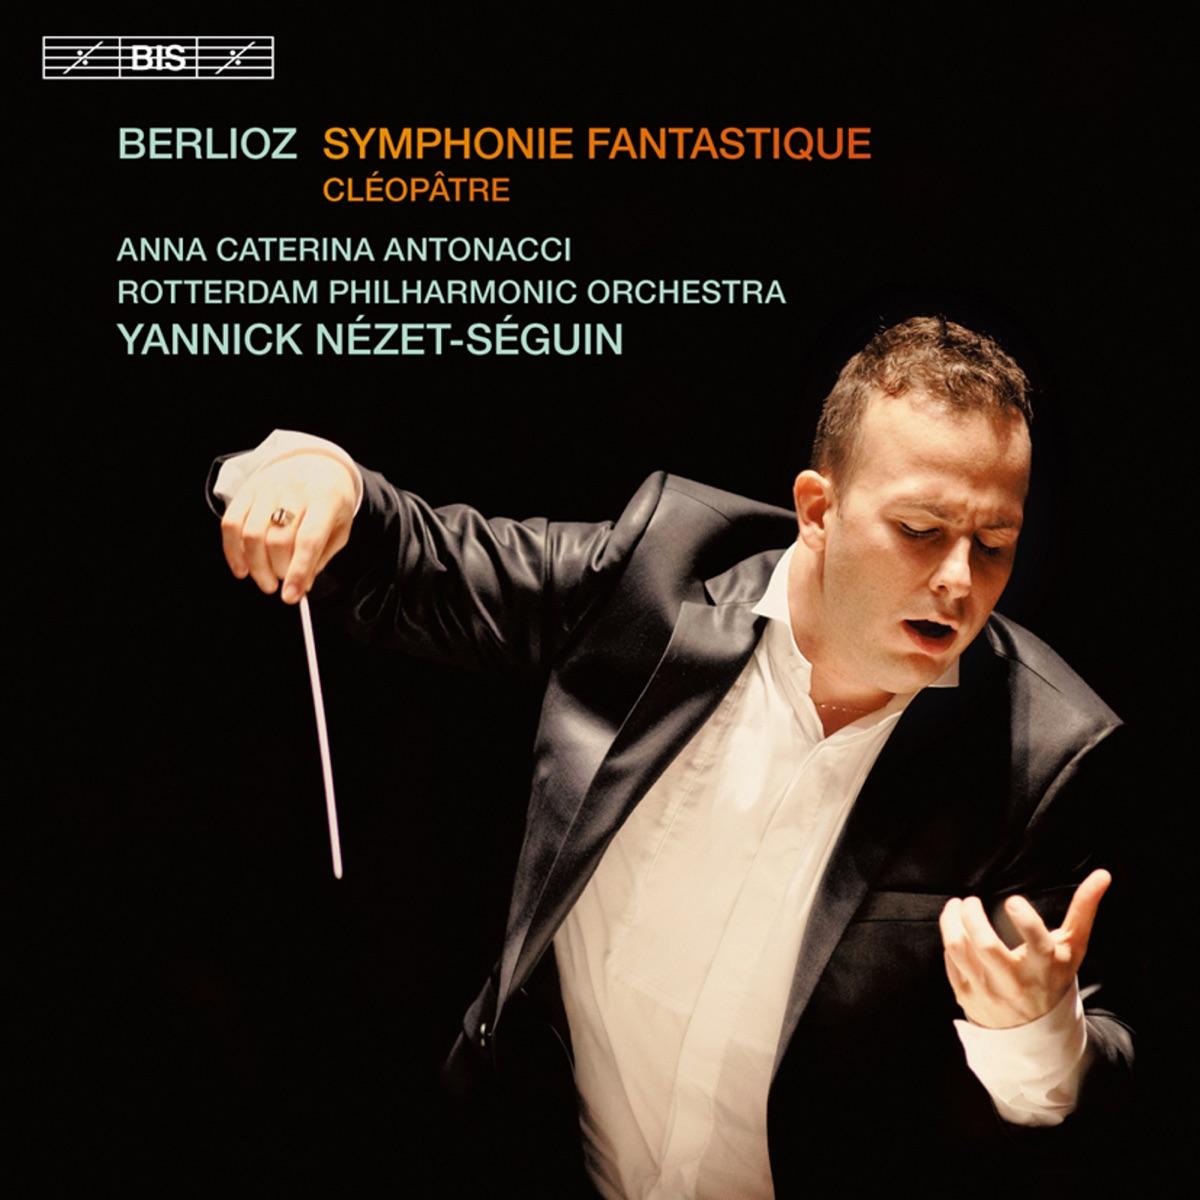 Berlioz Symphonie fantastique - Cléopâtre Yannick Nézet-Séguin Rotterdam Philharmonic Orchestra  Anna Caterina Antonacci CD cover